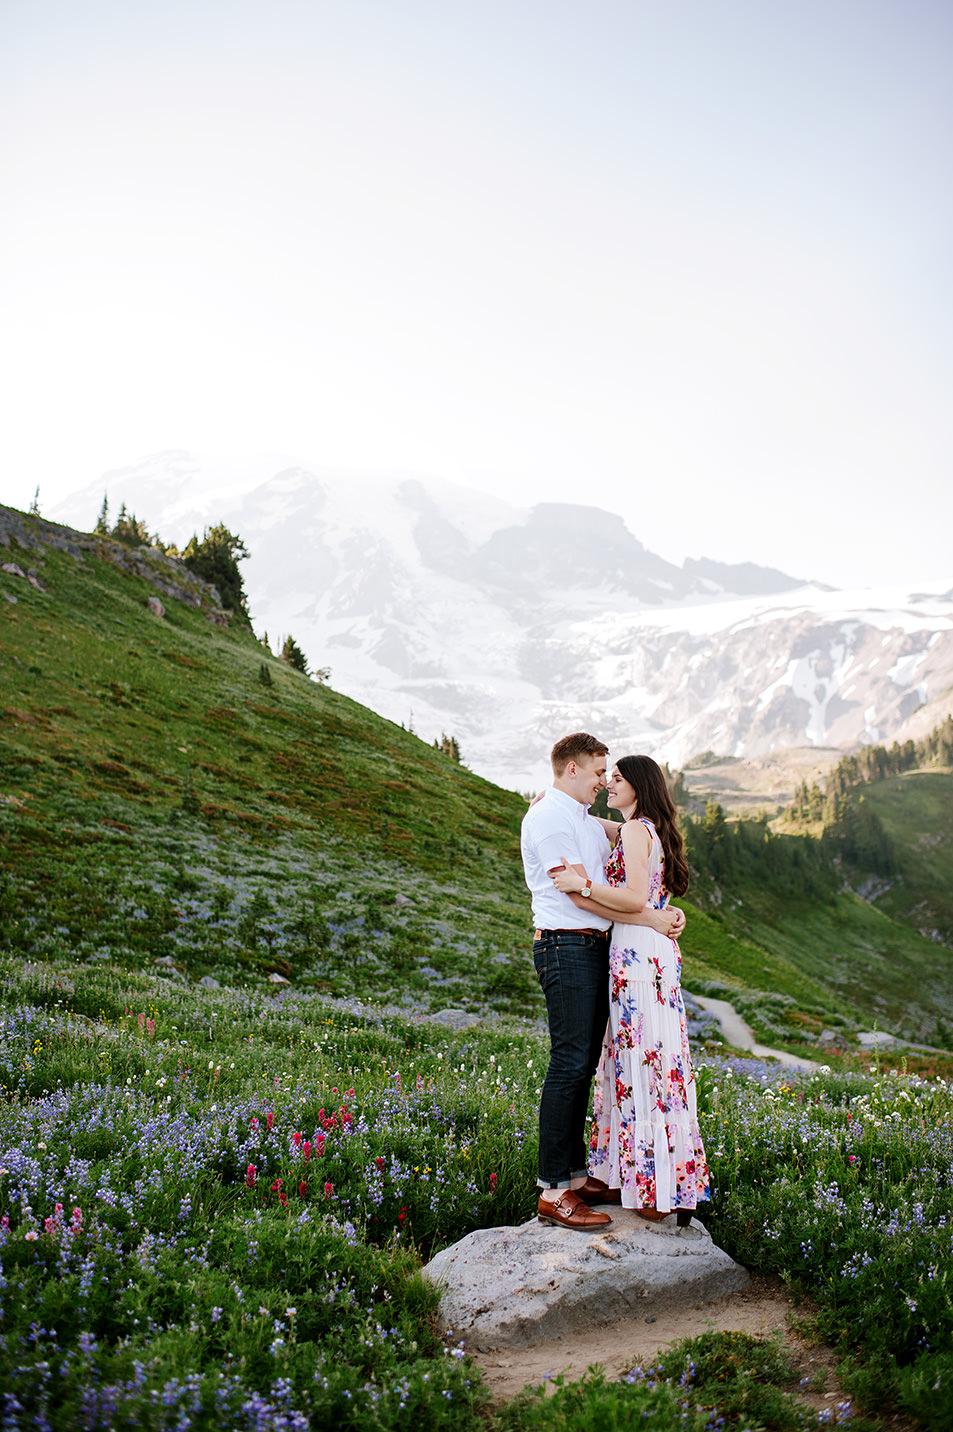 mount-rainier-engagement-photos-portland-wedding-photographer15.jpg